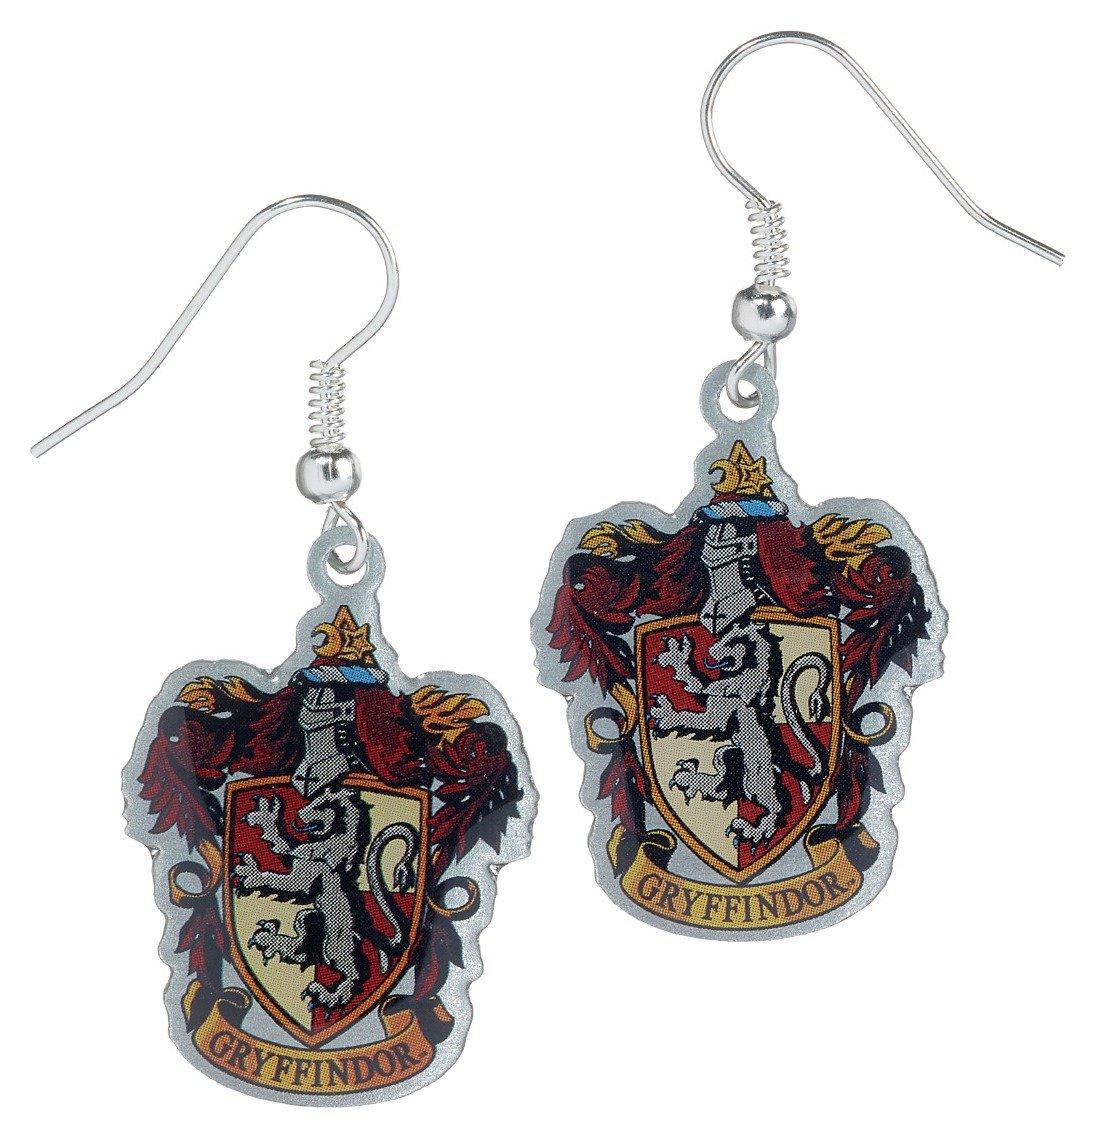 Image of Harry Potter Gryffindor Crest Earrings